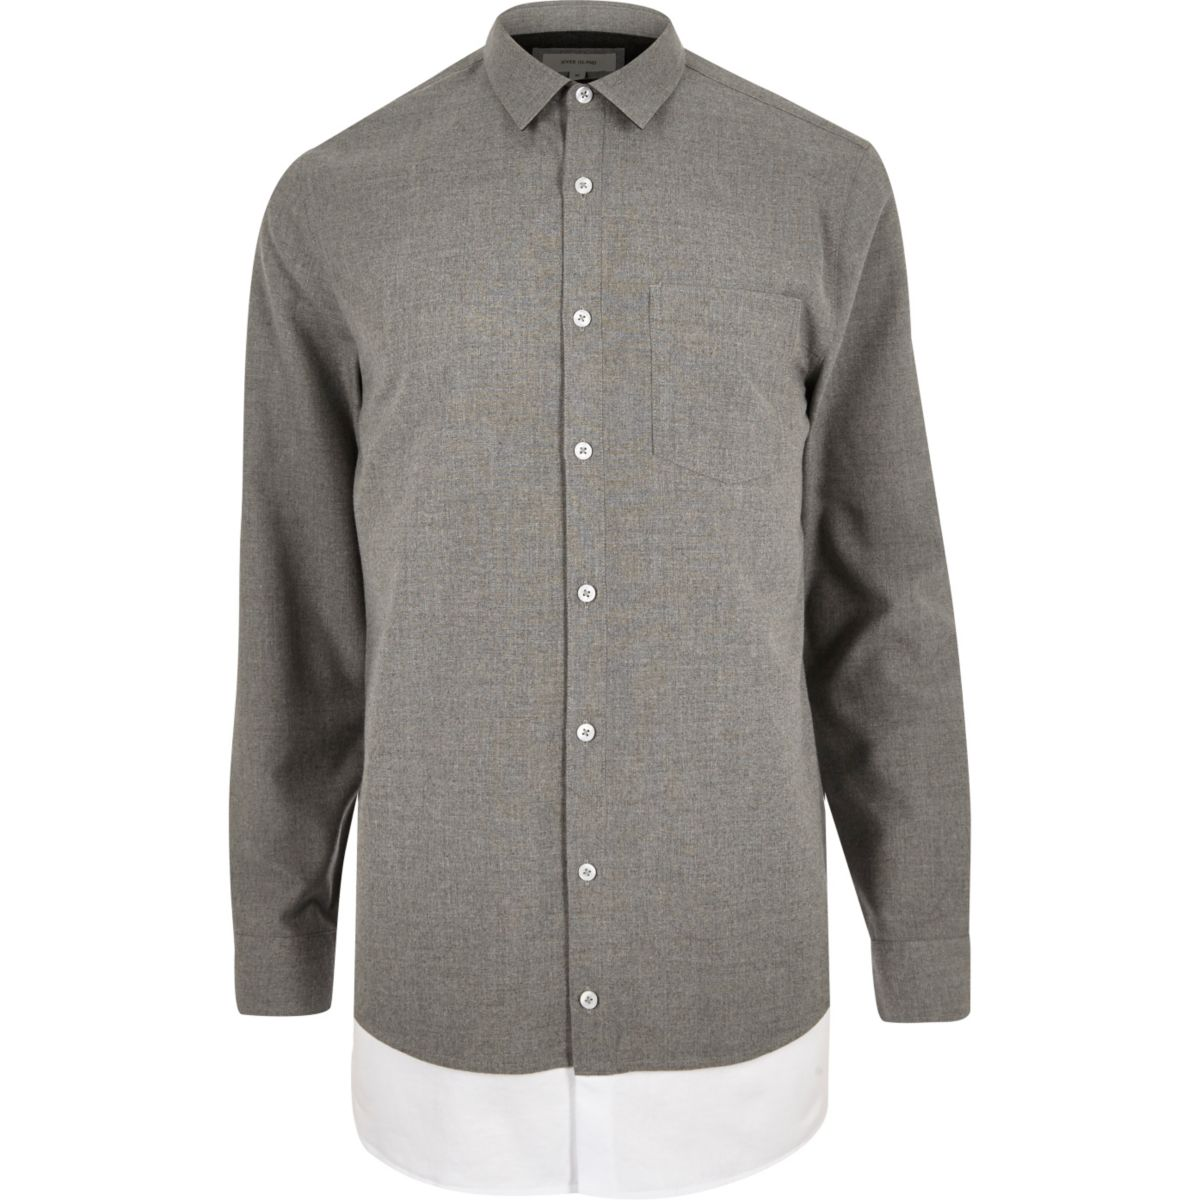 Grey casual layered longline shirt